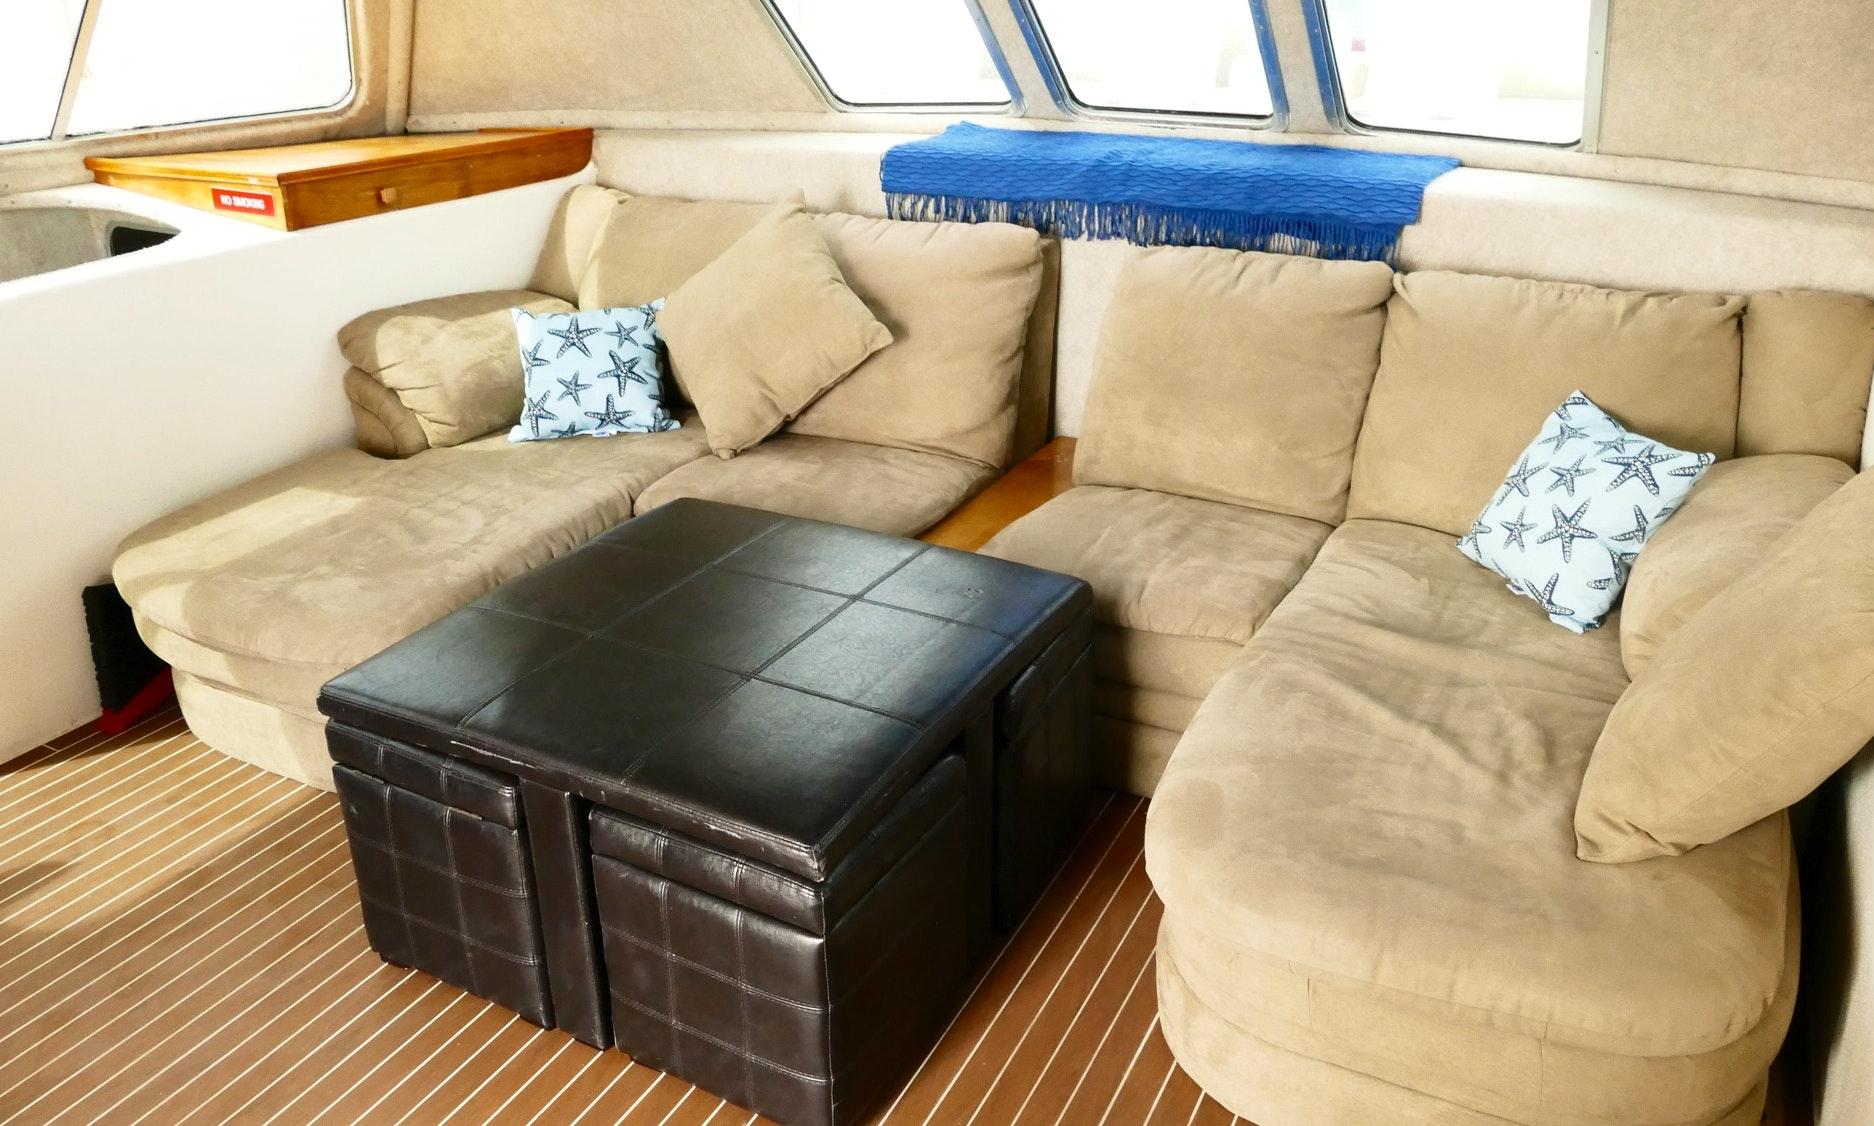 45' Big Power Catamaran Charter in Miami, Florida   GetMyBoat